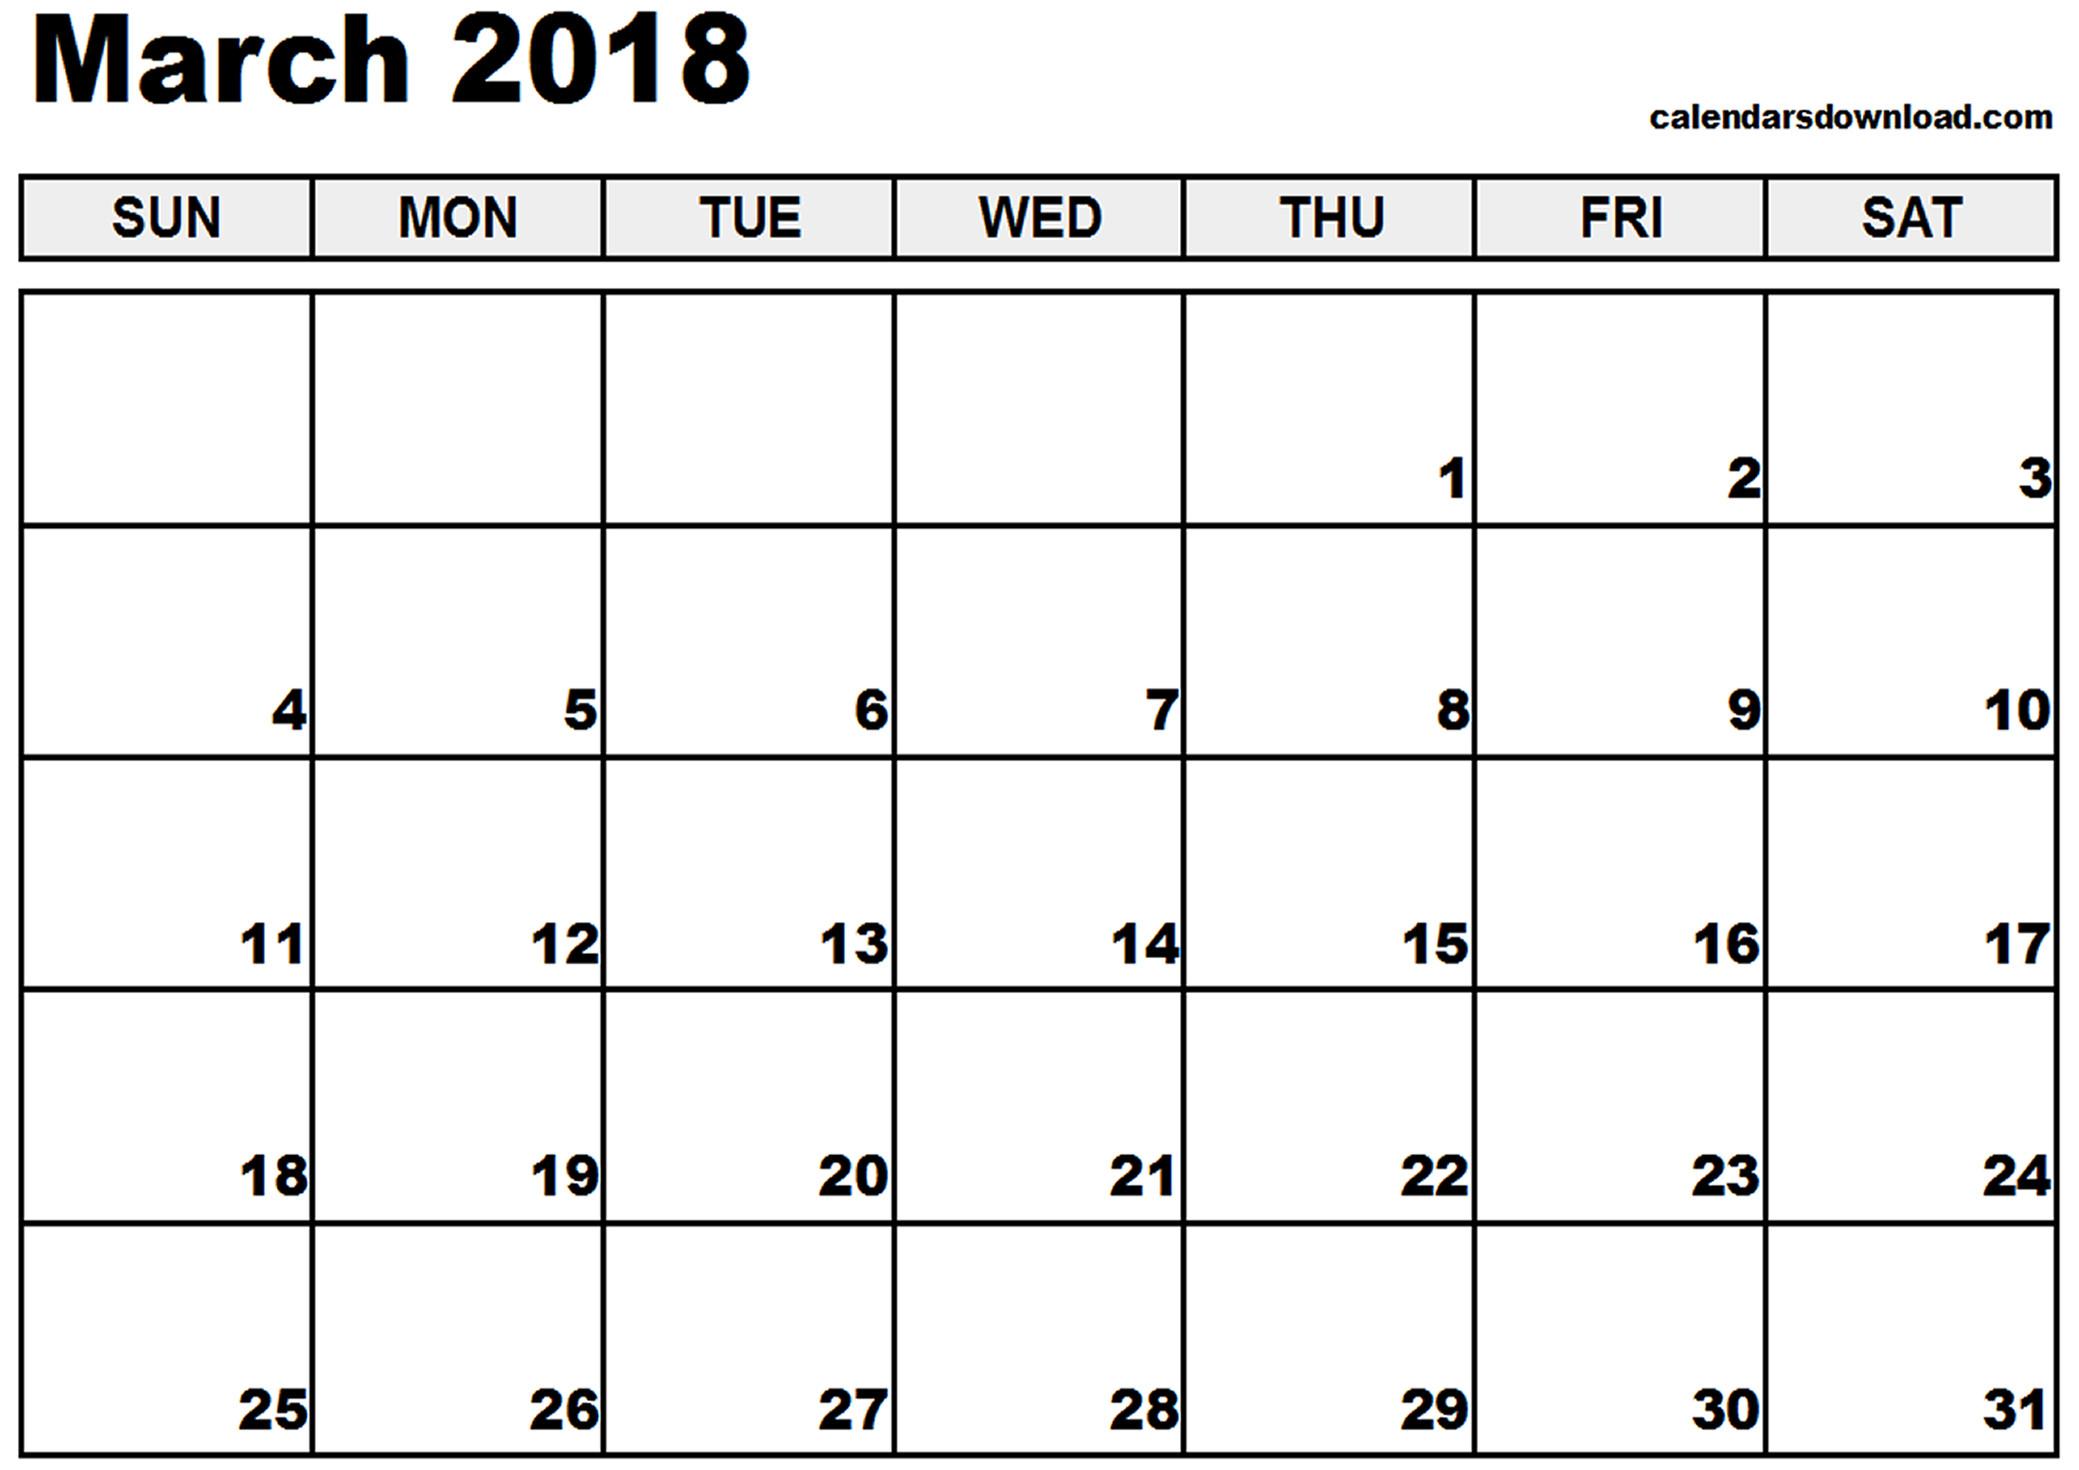 fhm wallpaper calendar 2018